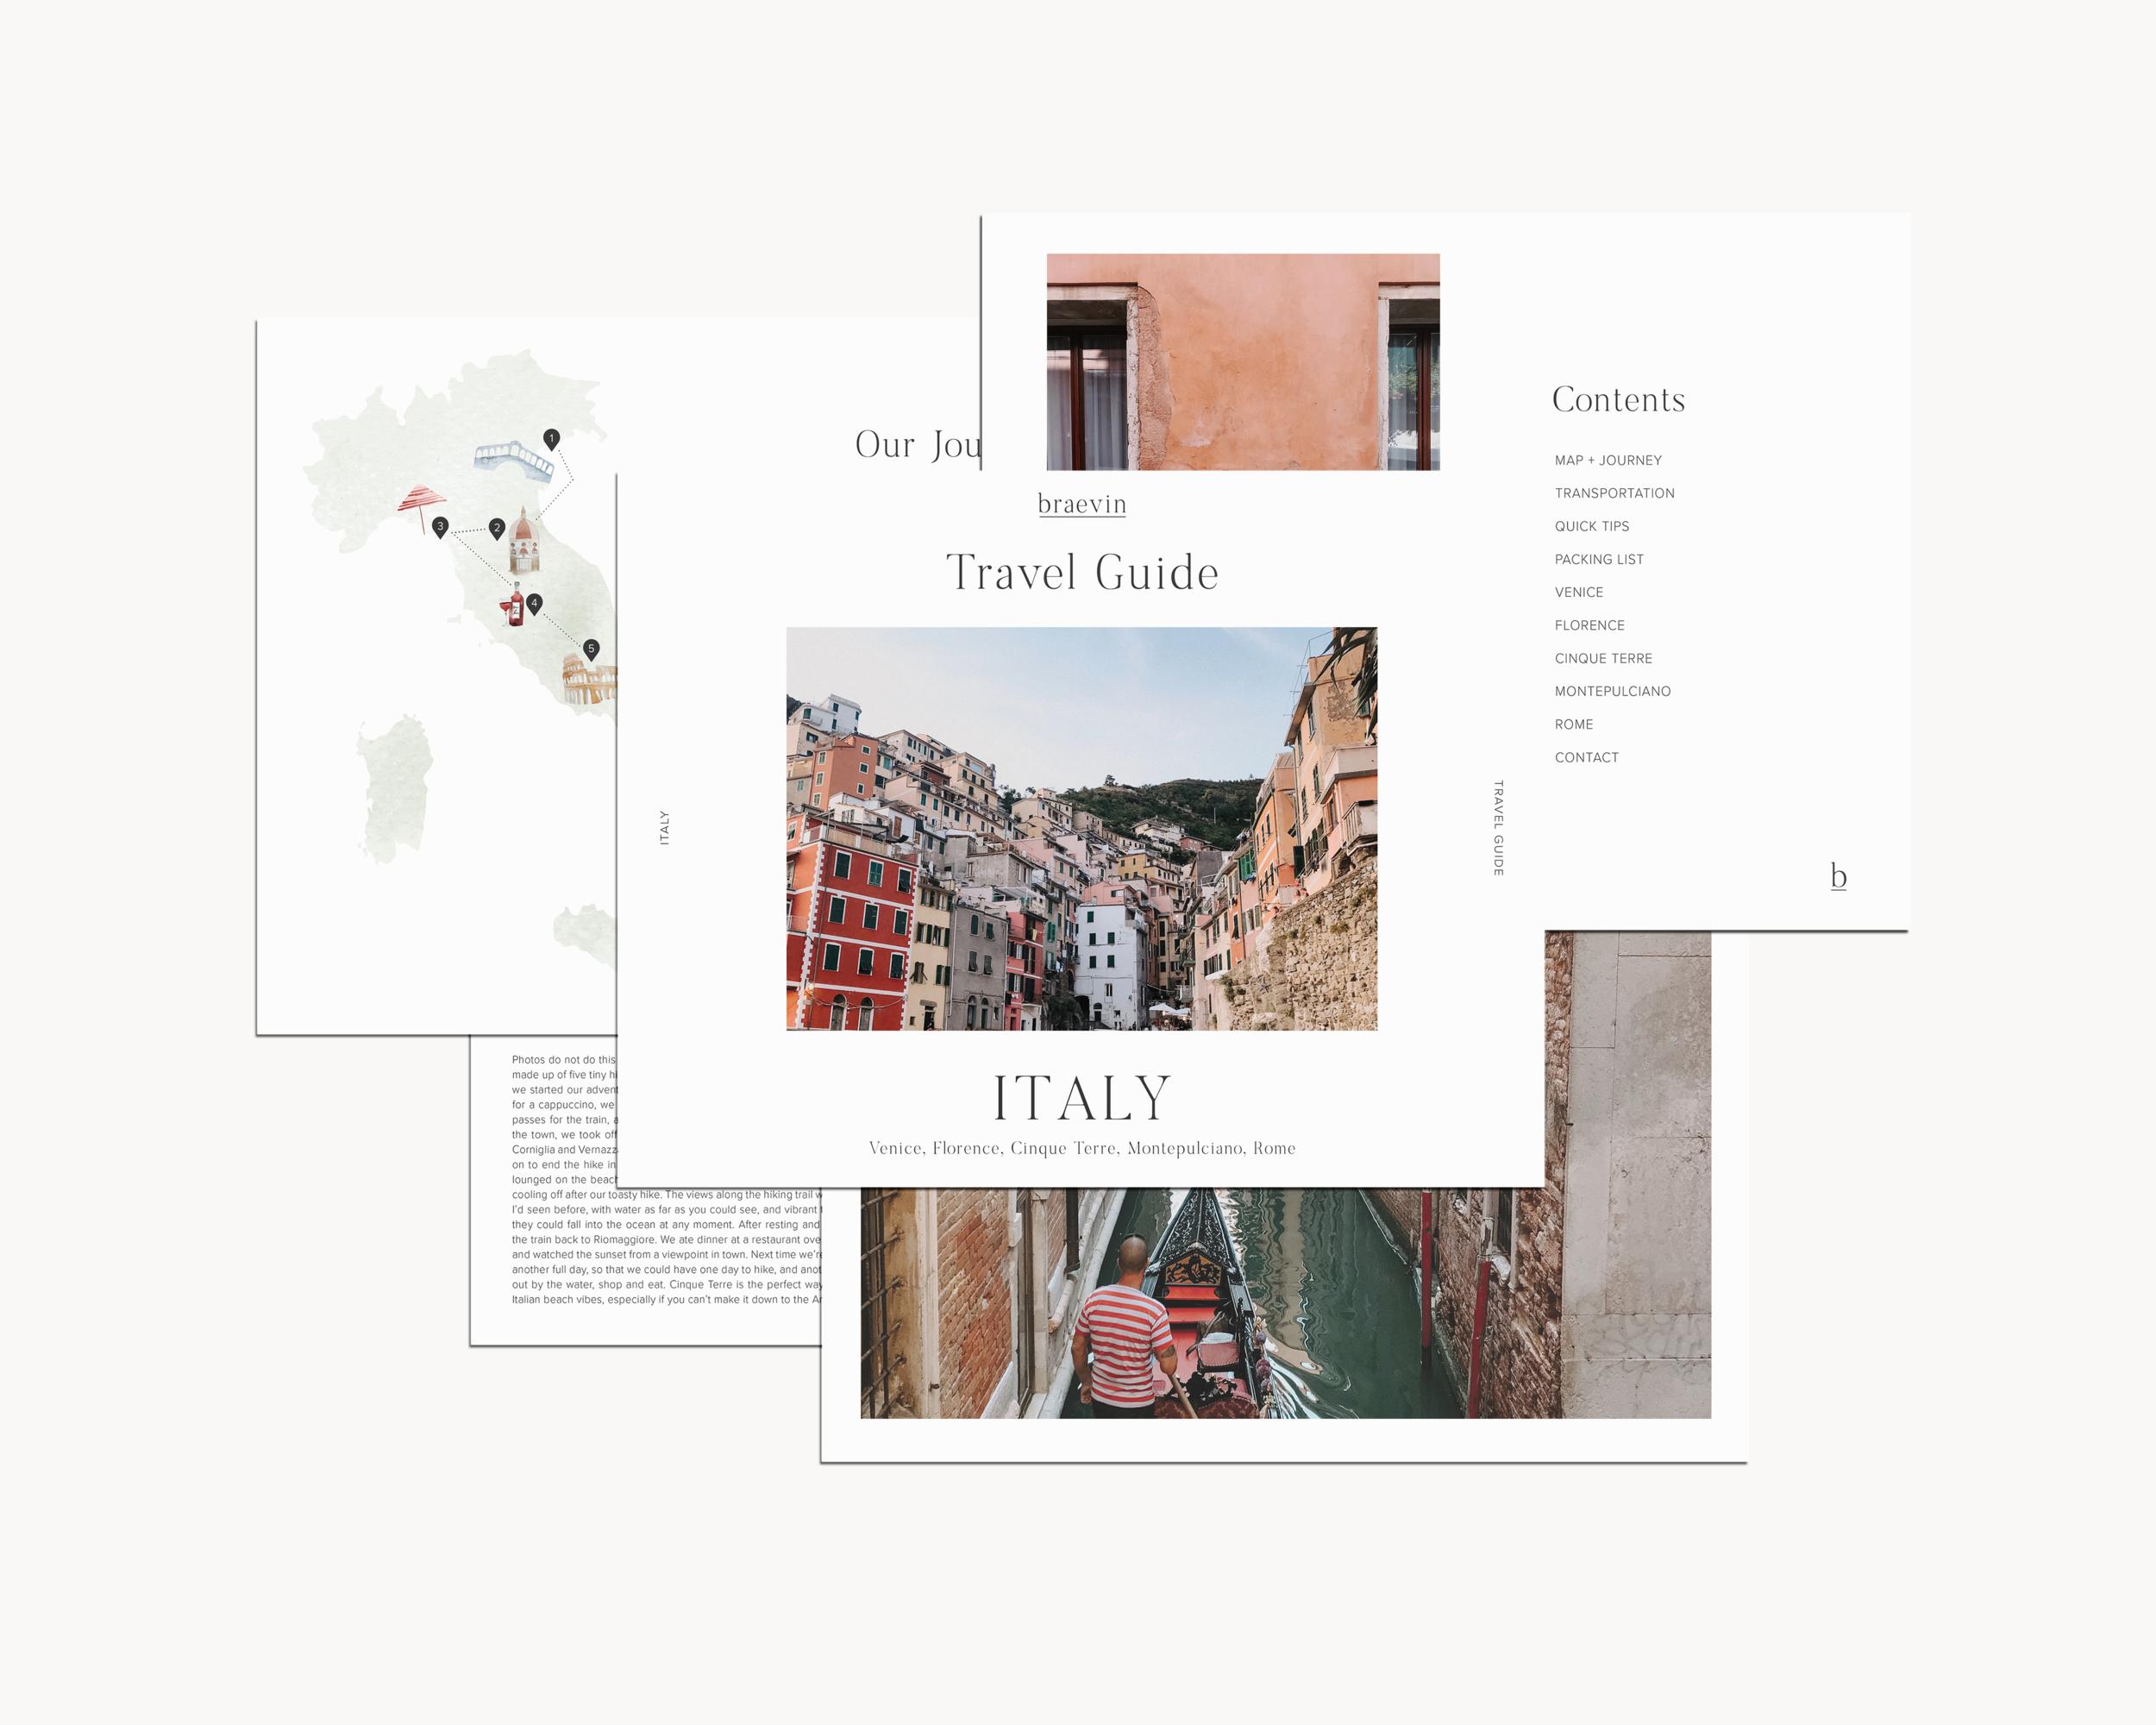 Italy-Guide-Mockup-Printed-Full.png